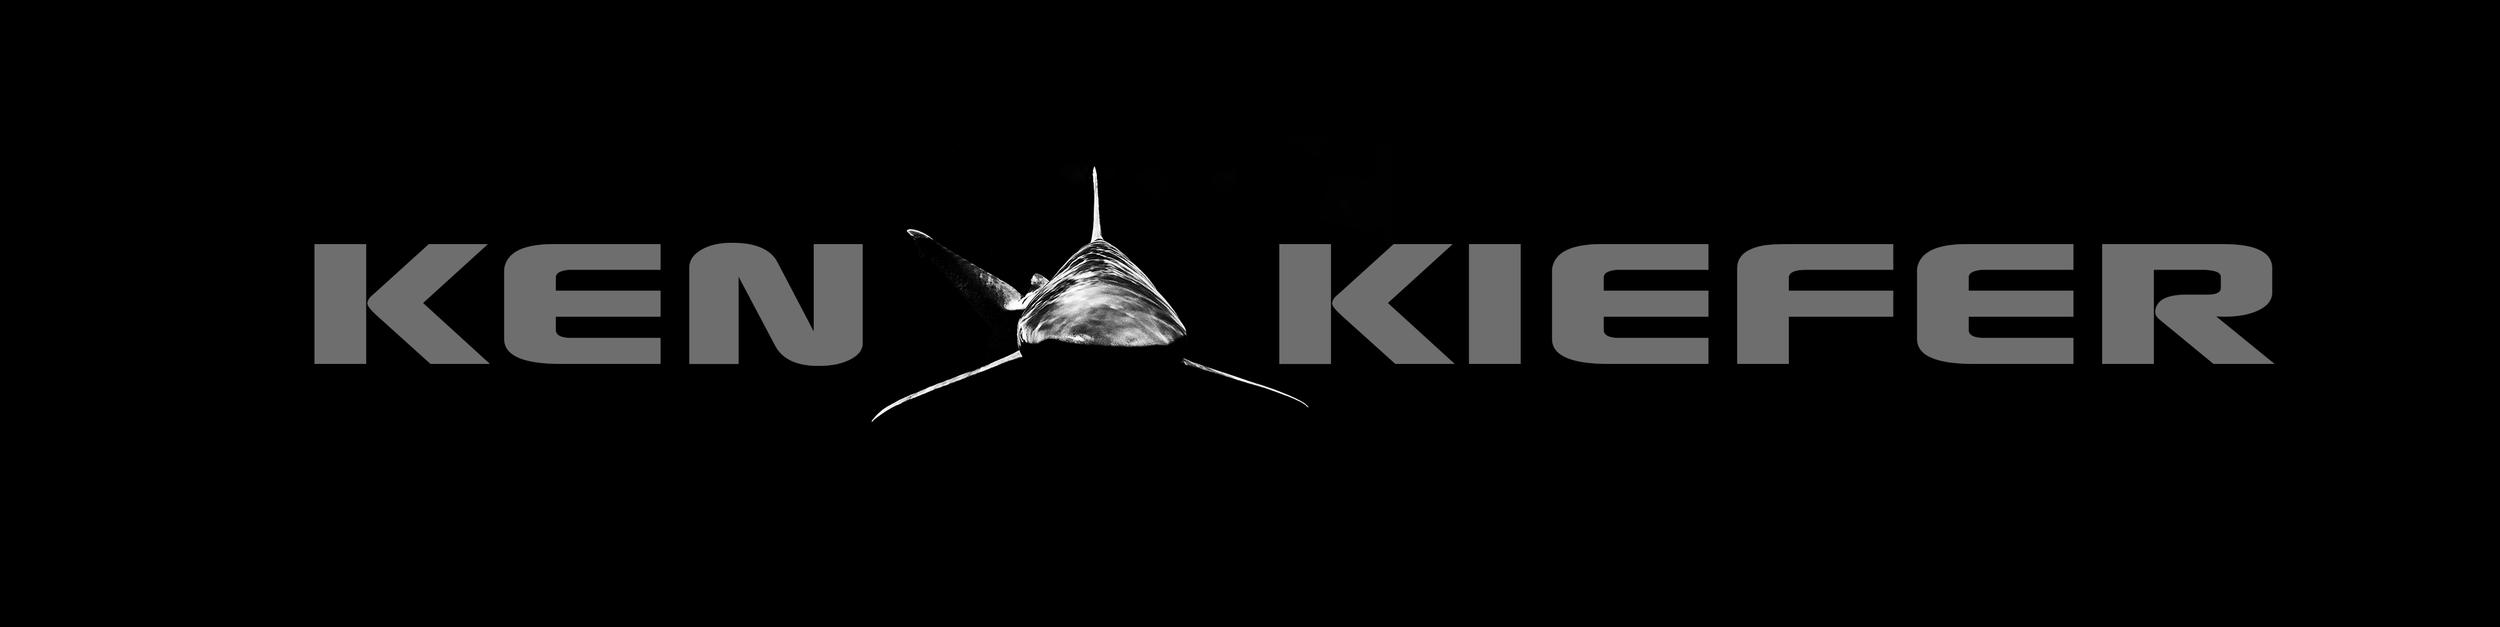 ken new logo.png